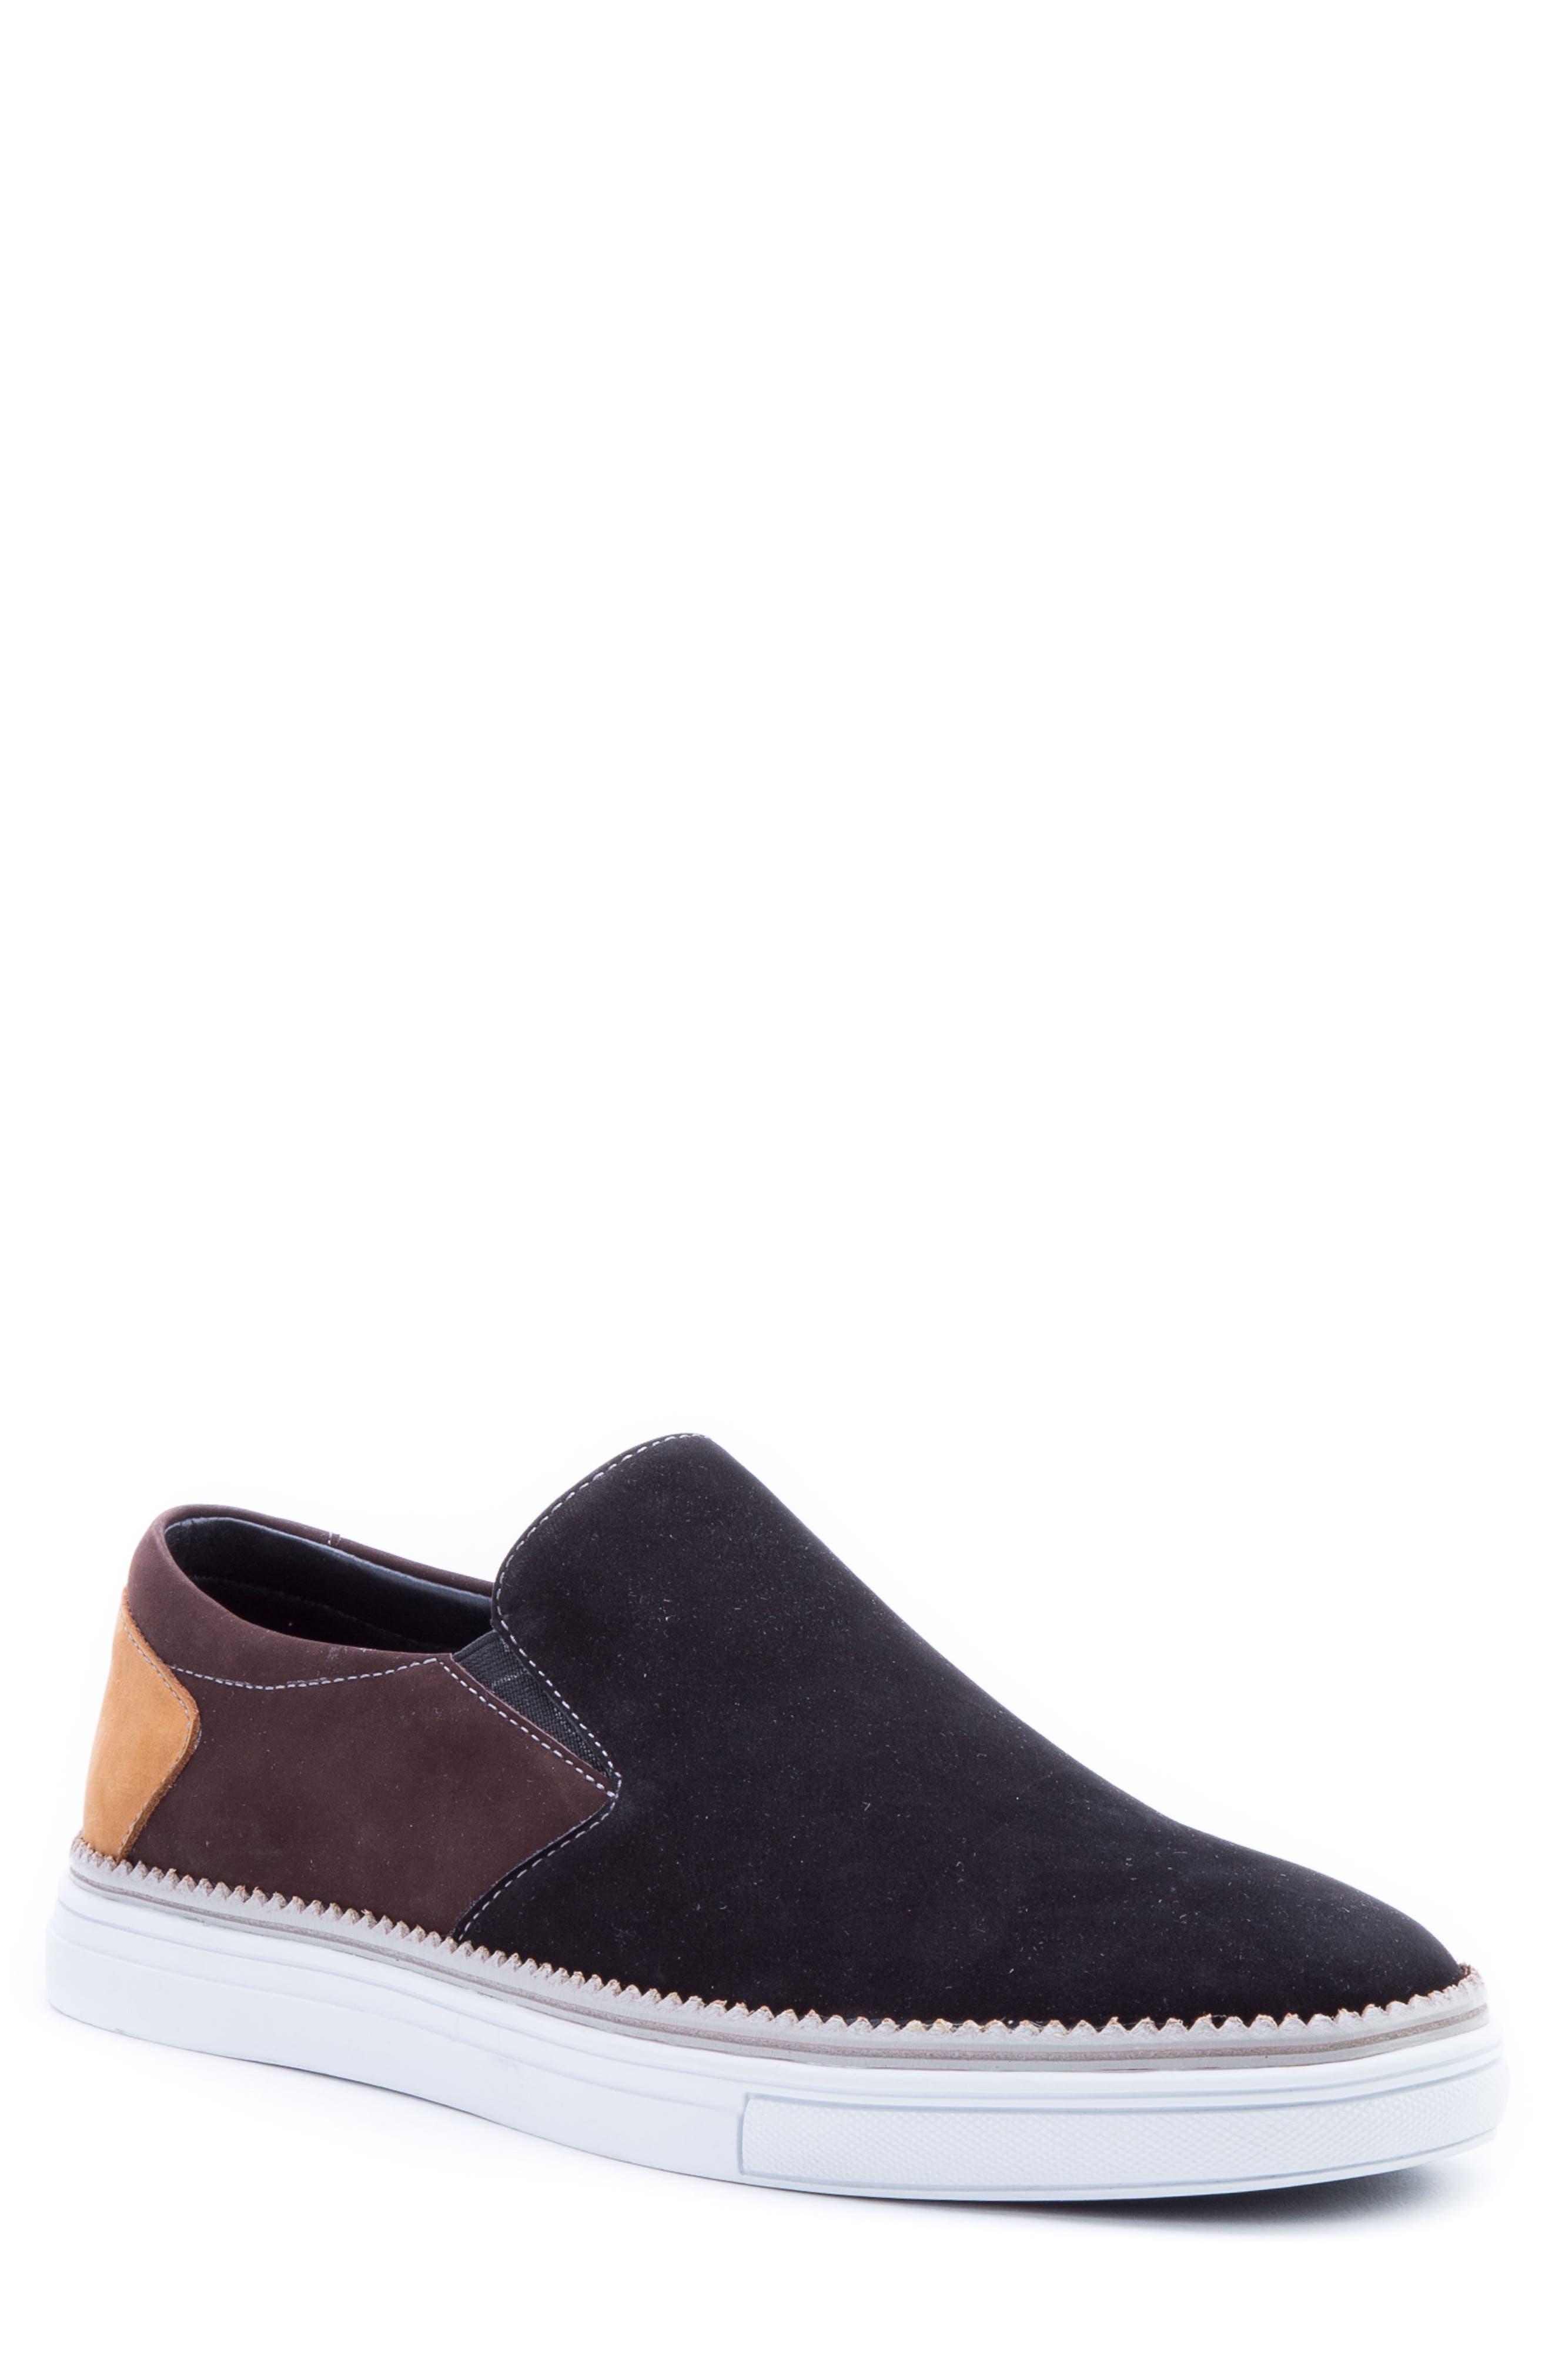 ZANZARA,                             Rivera Colorblocked Slip-On Sneaker,                             Main thumbnail 1, color,                             001